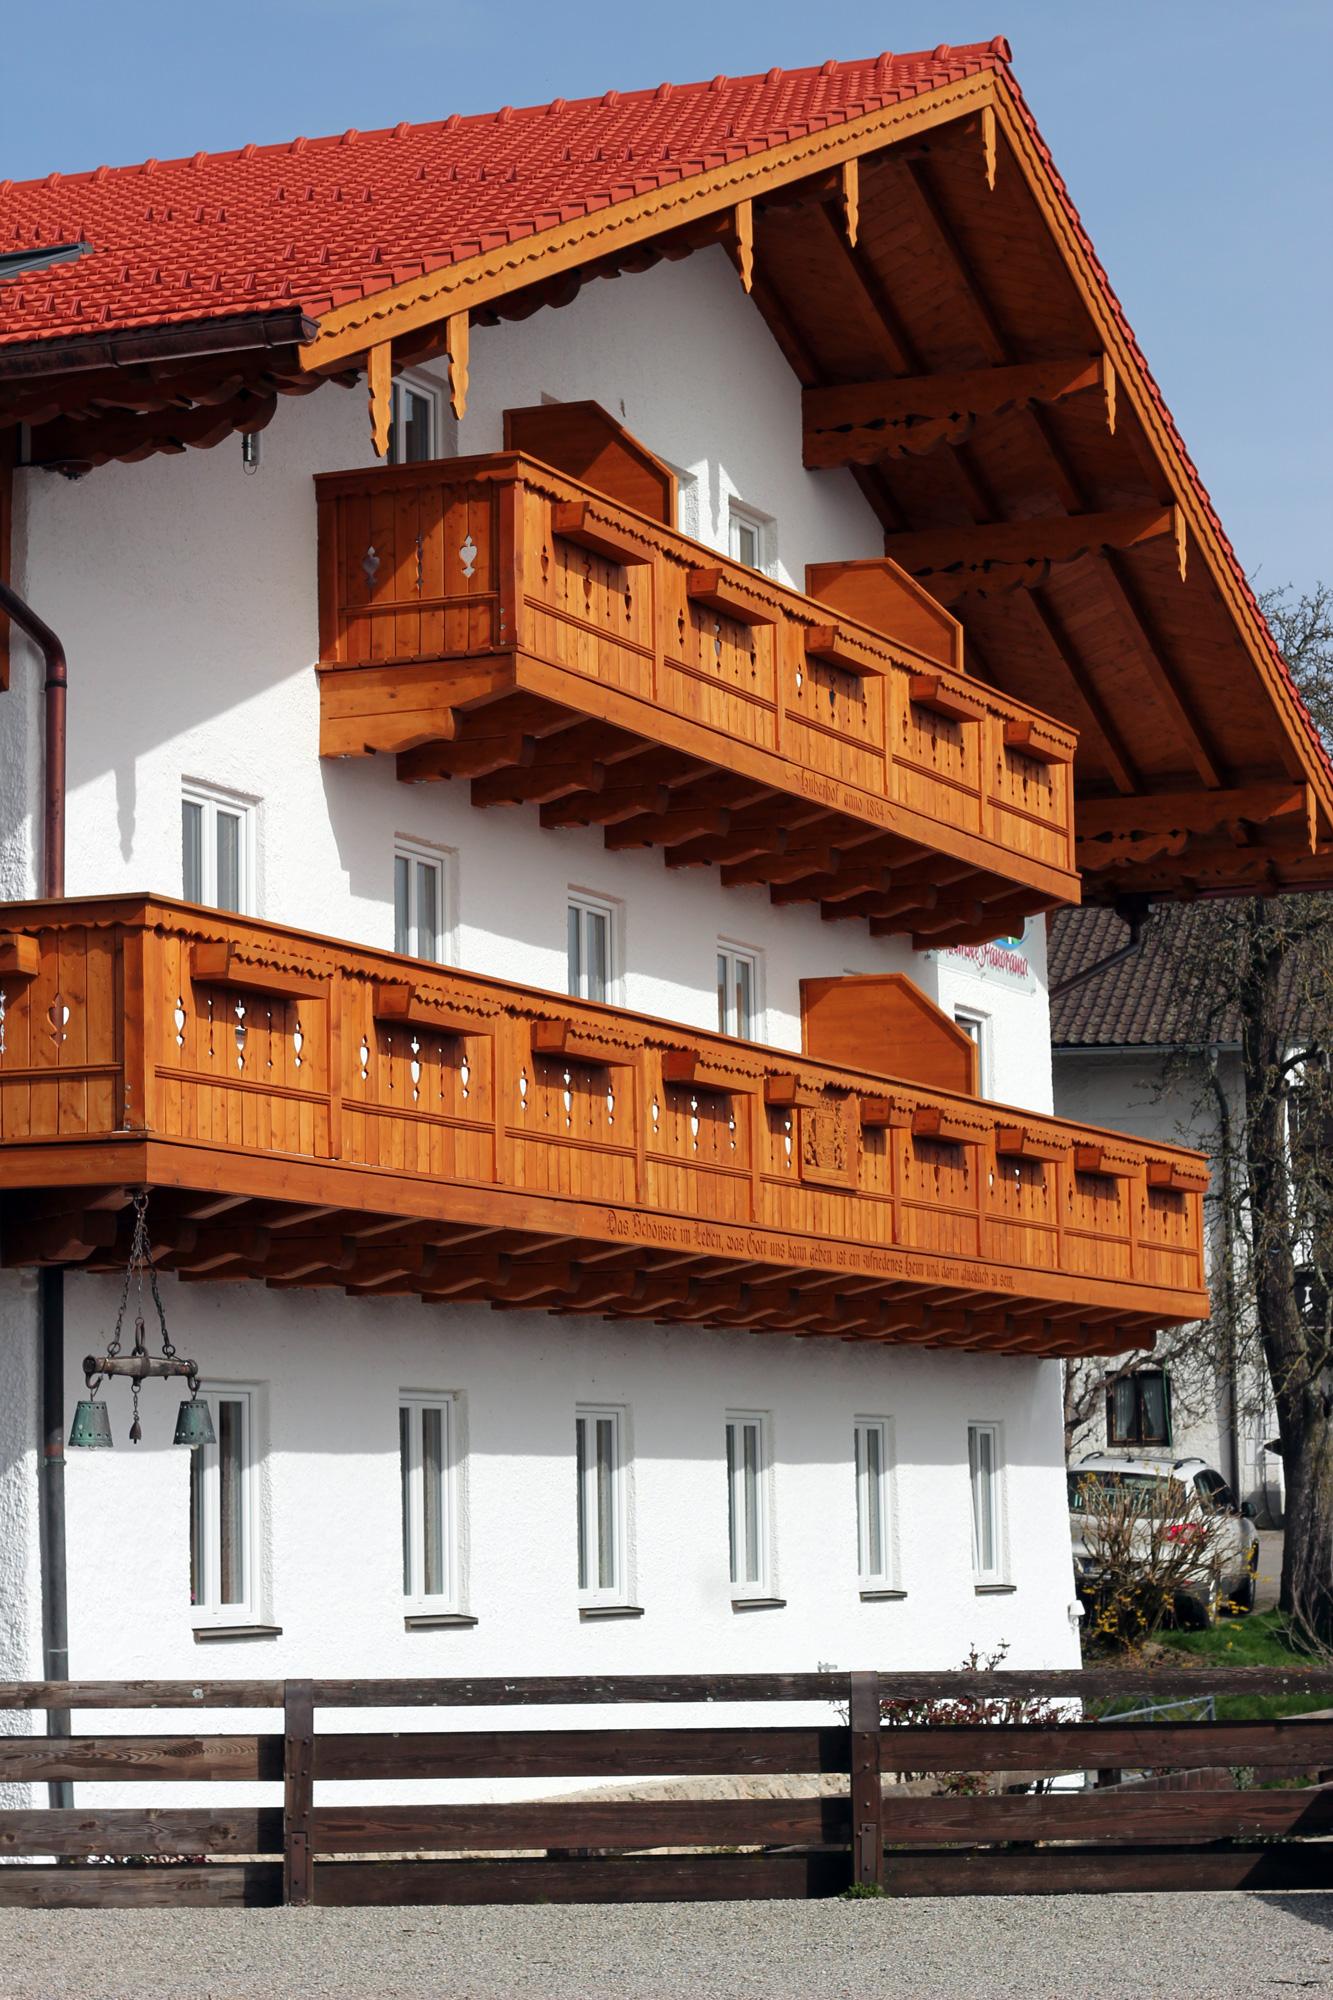 Cheimsee-lake-Bayern-weekend-escape-6